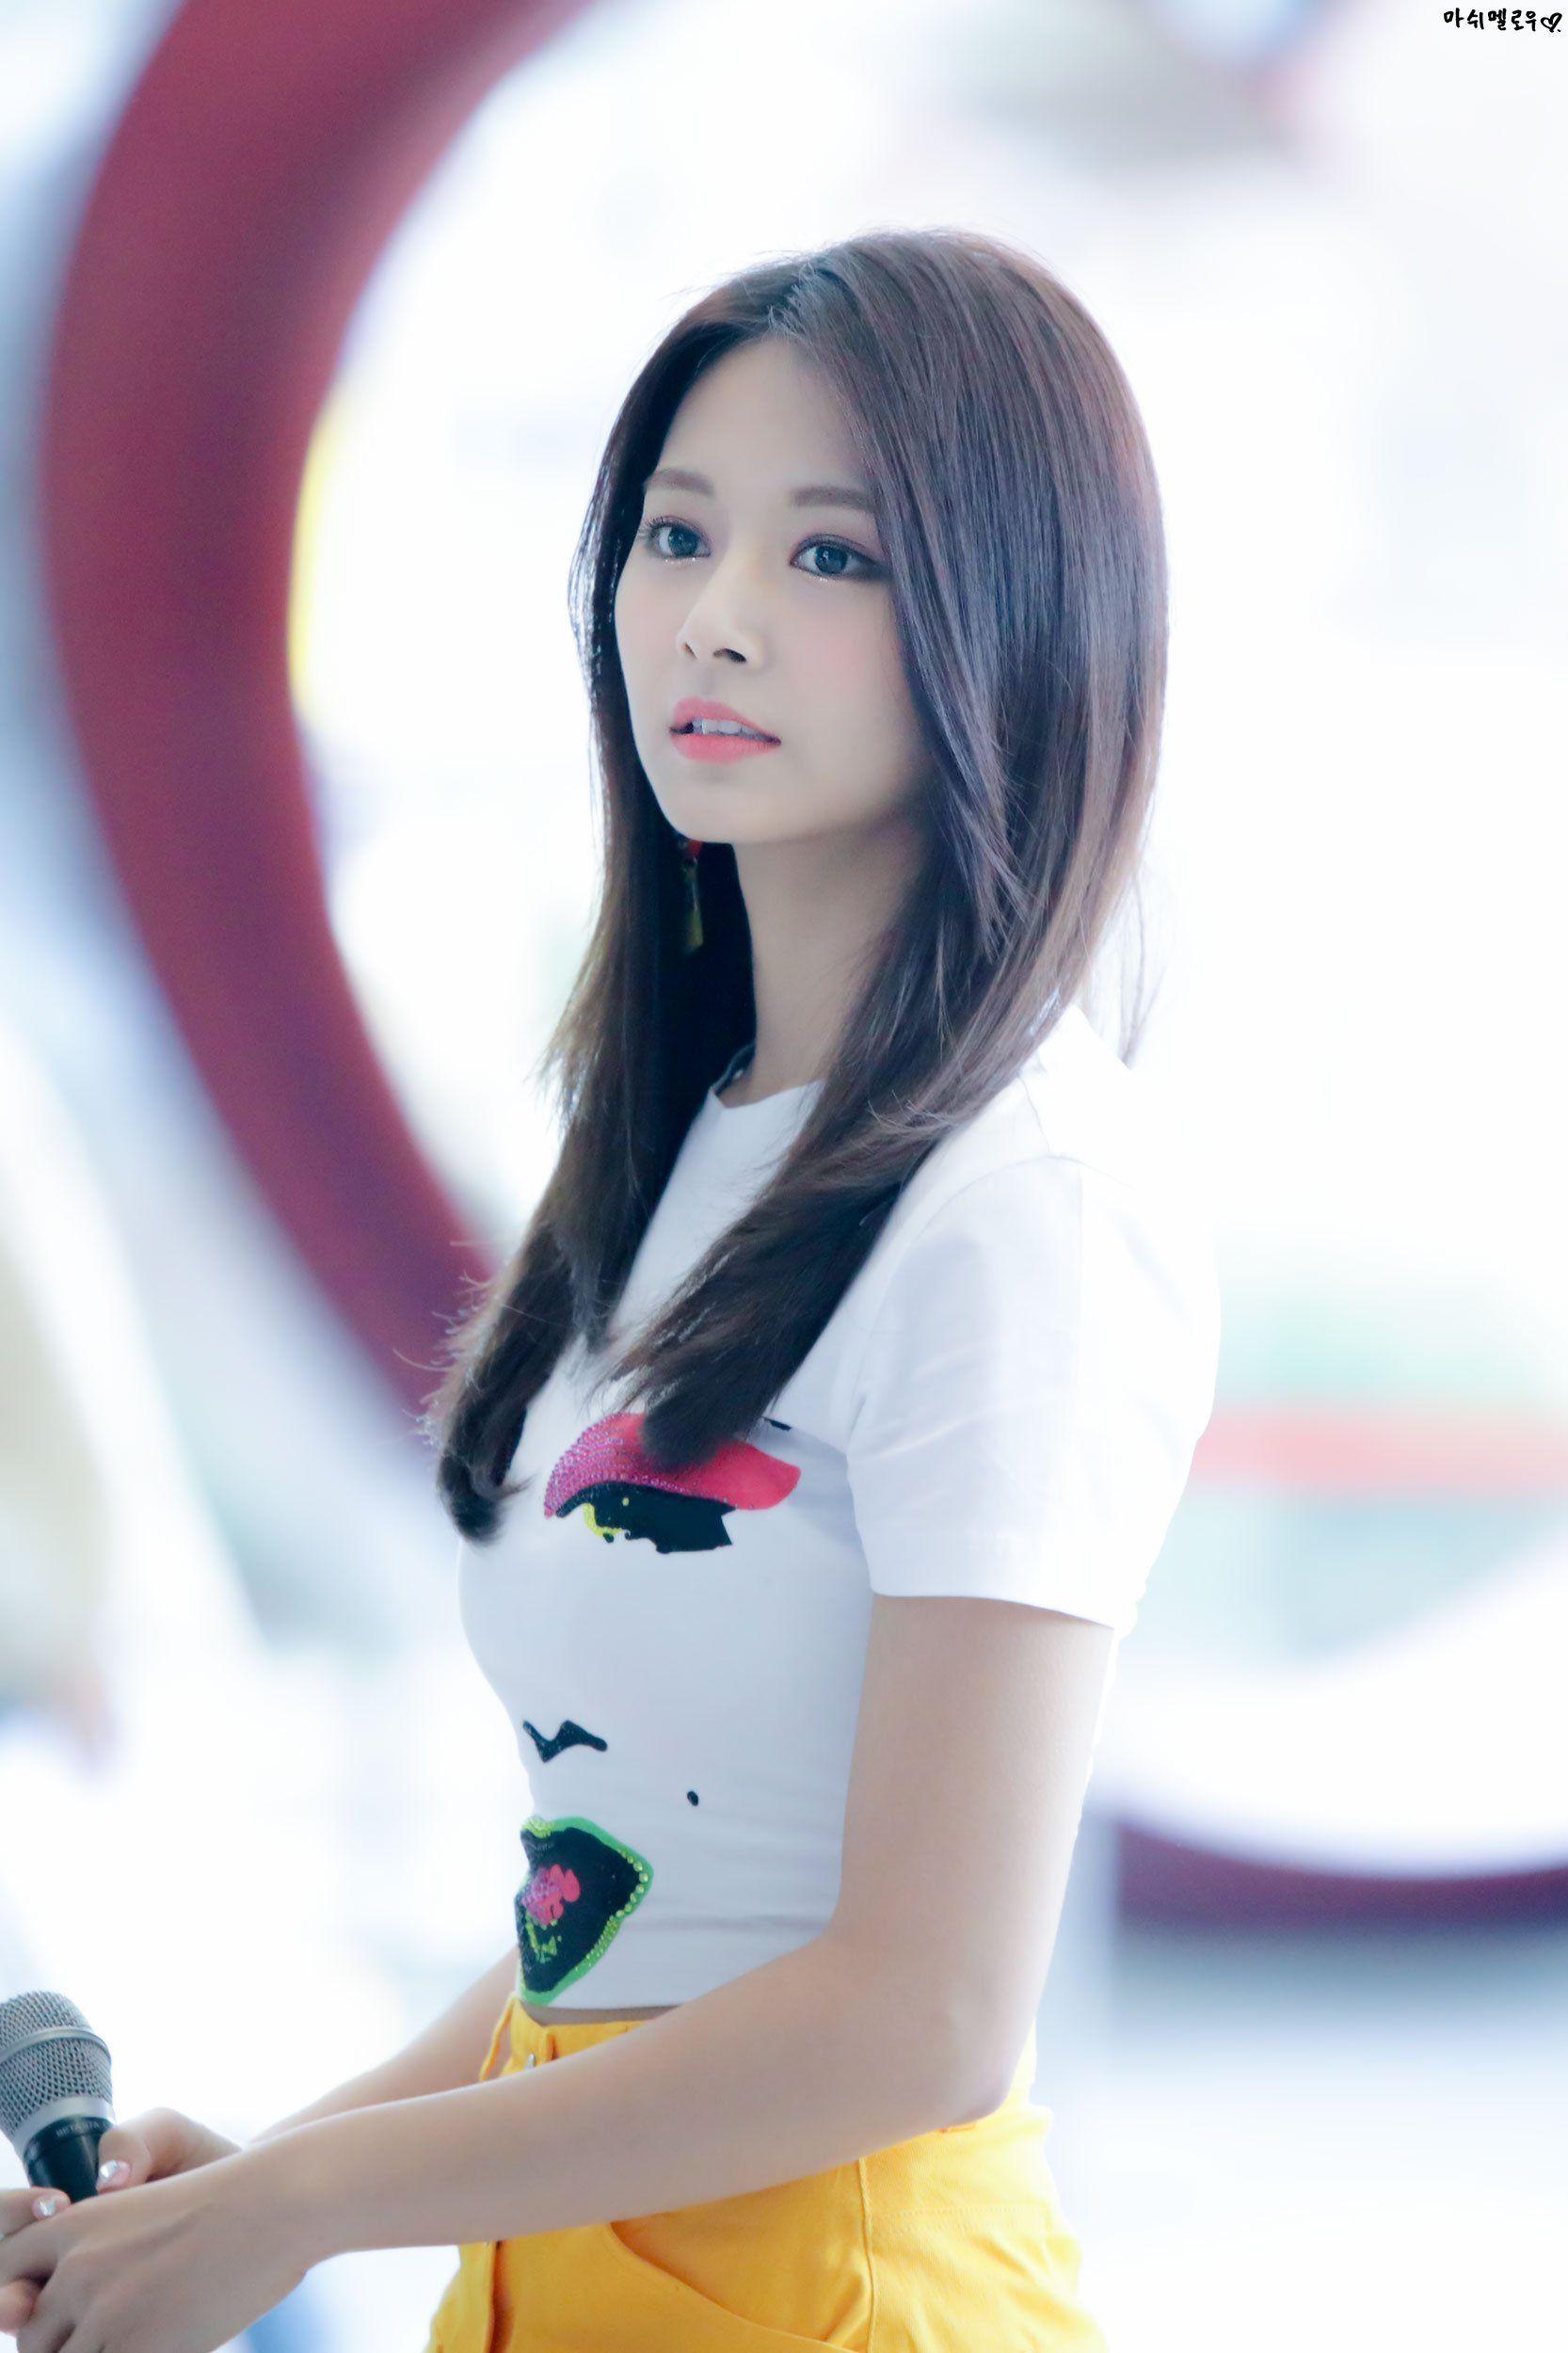 south korean women hot